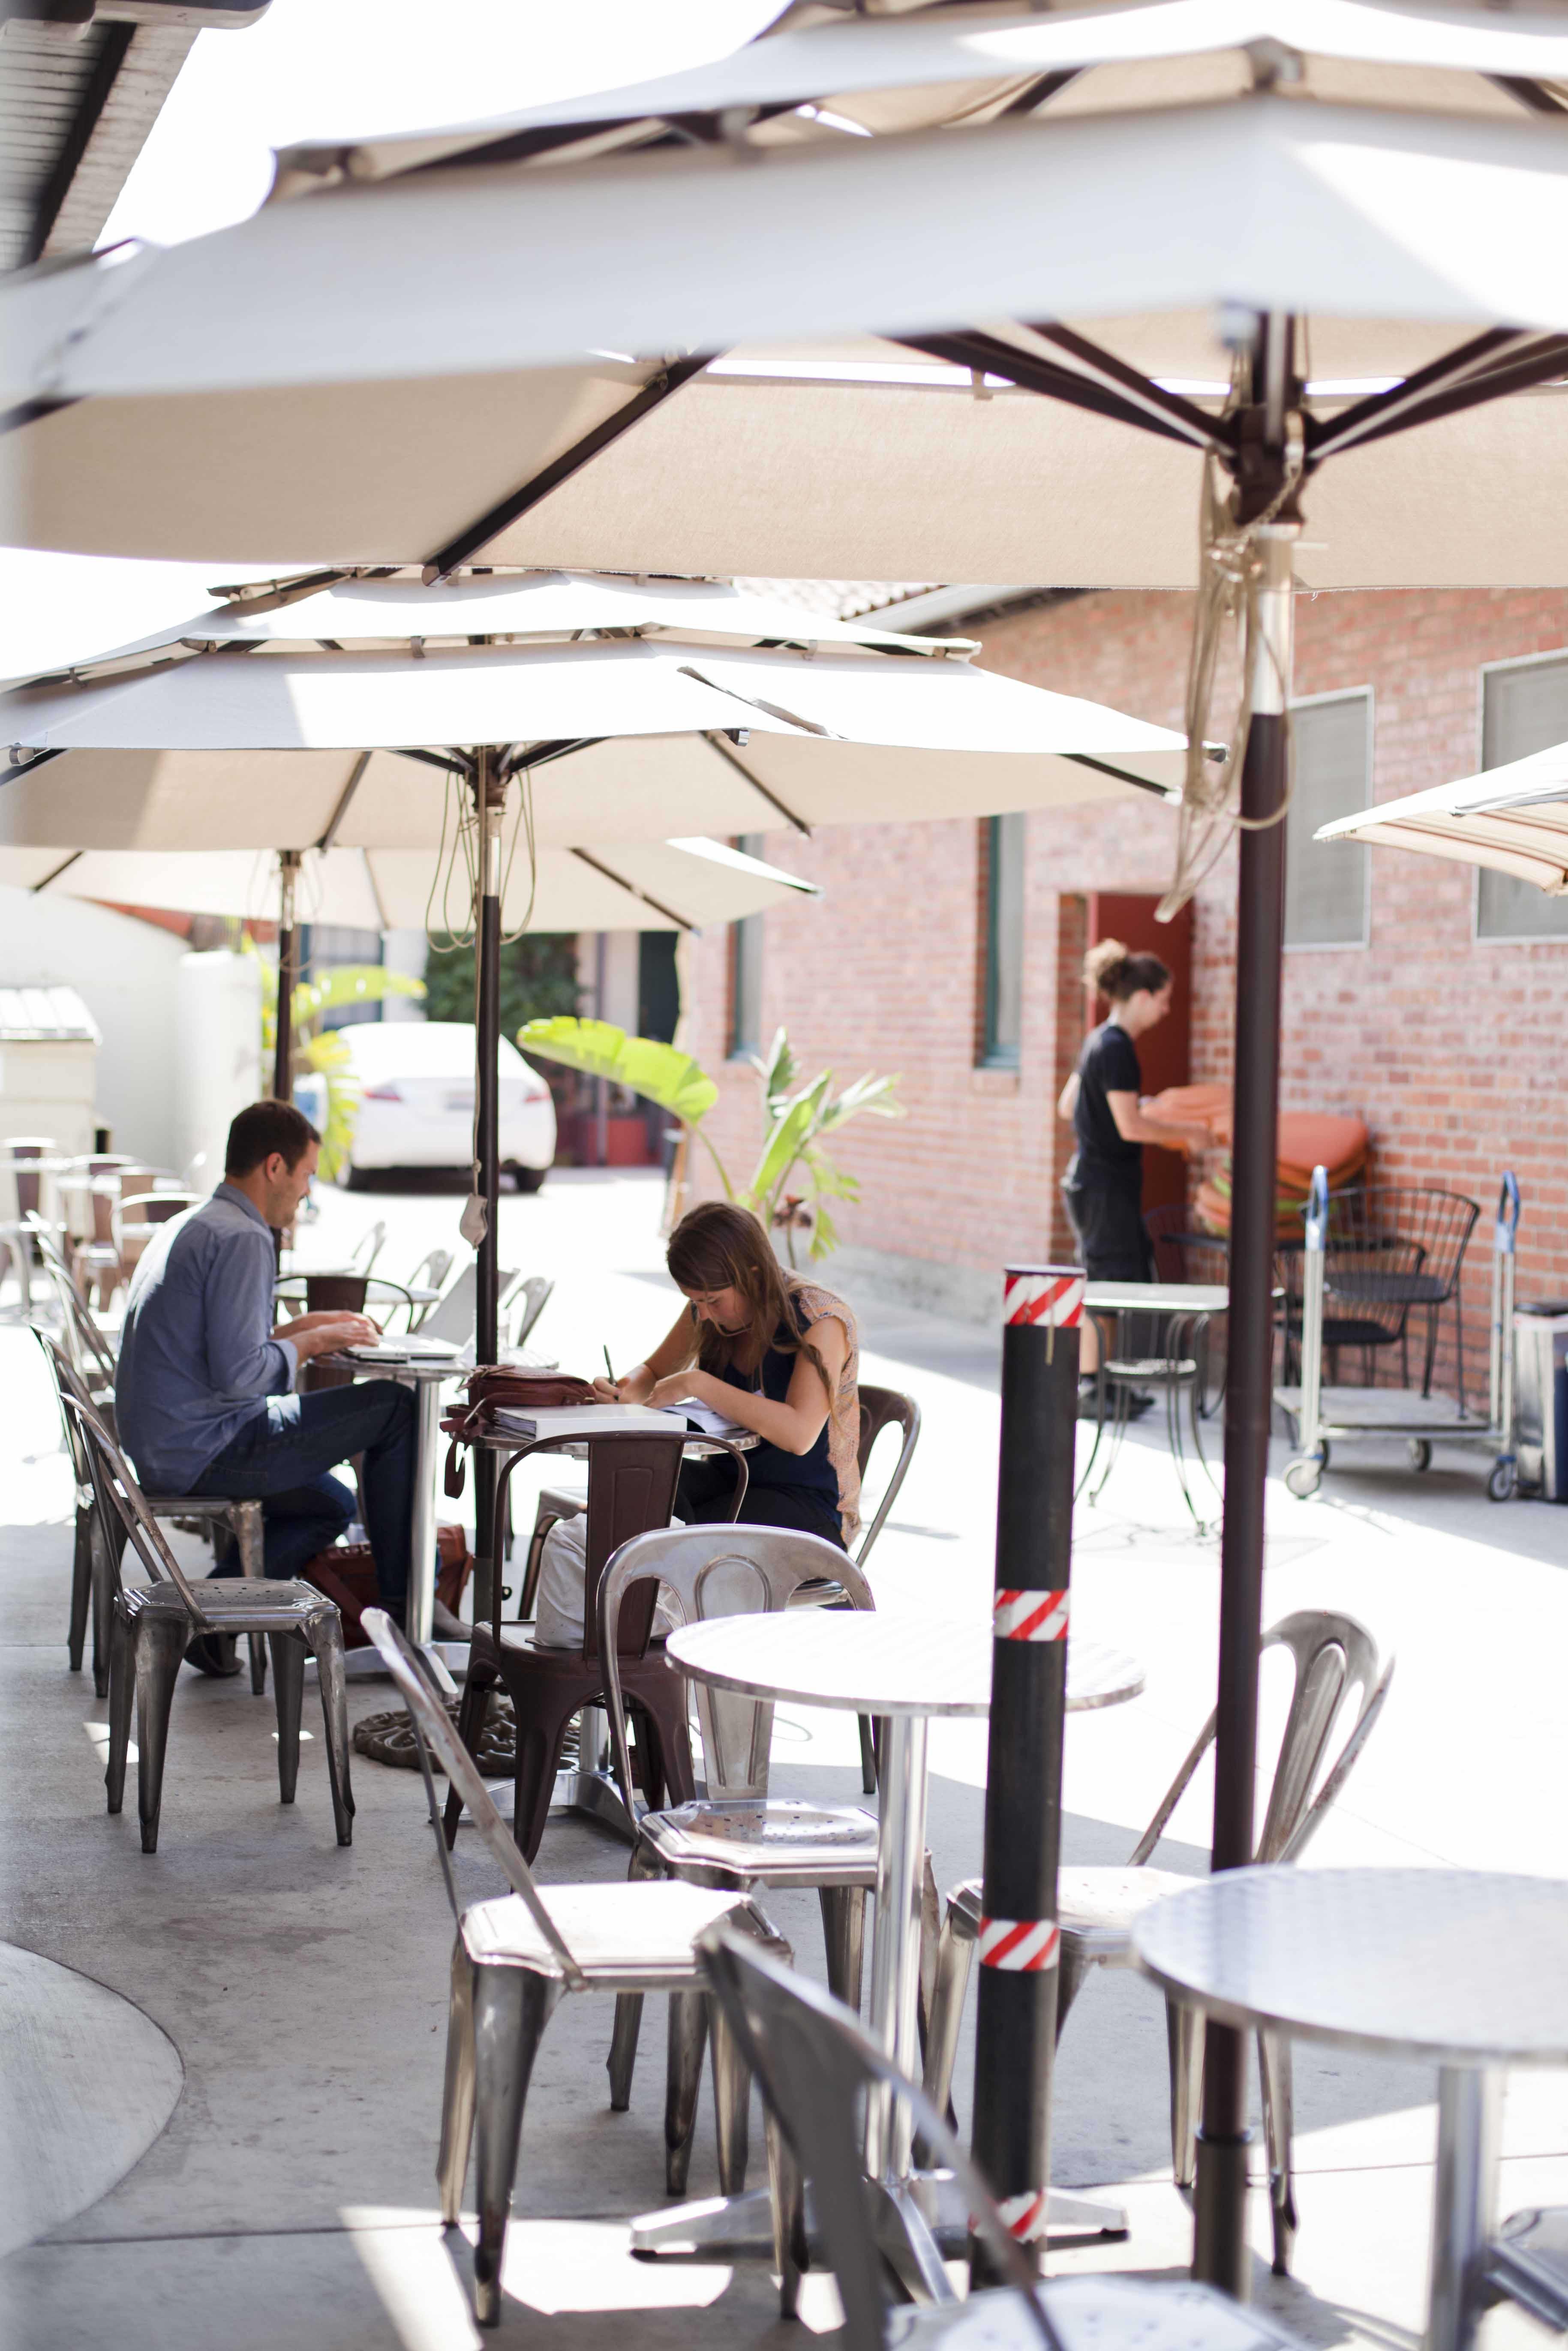 From Bean to Brew: Small Batch Roaster Handlebar Coffee in Santa Barbara: gallery image 9